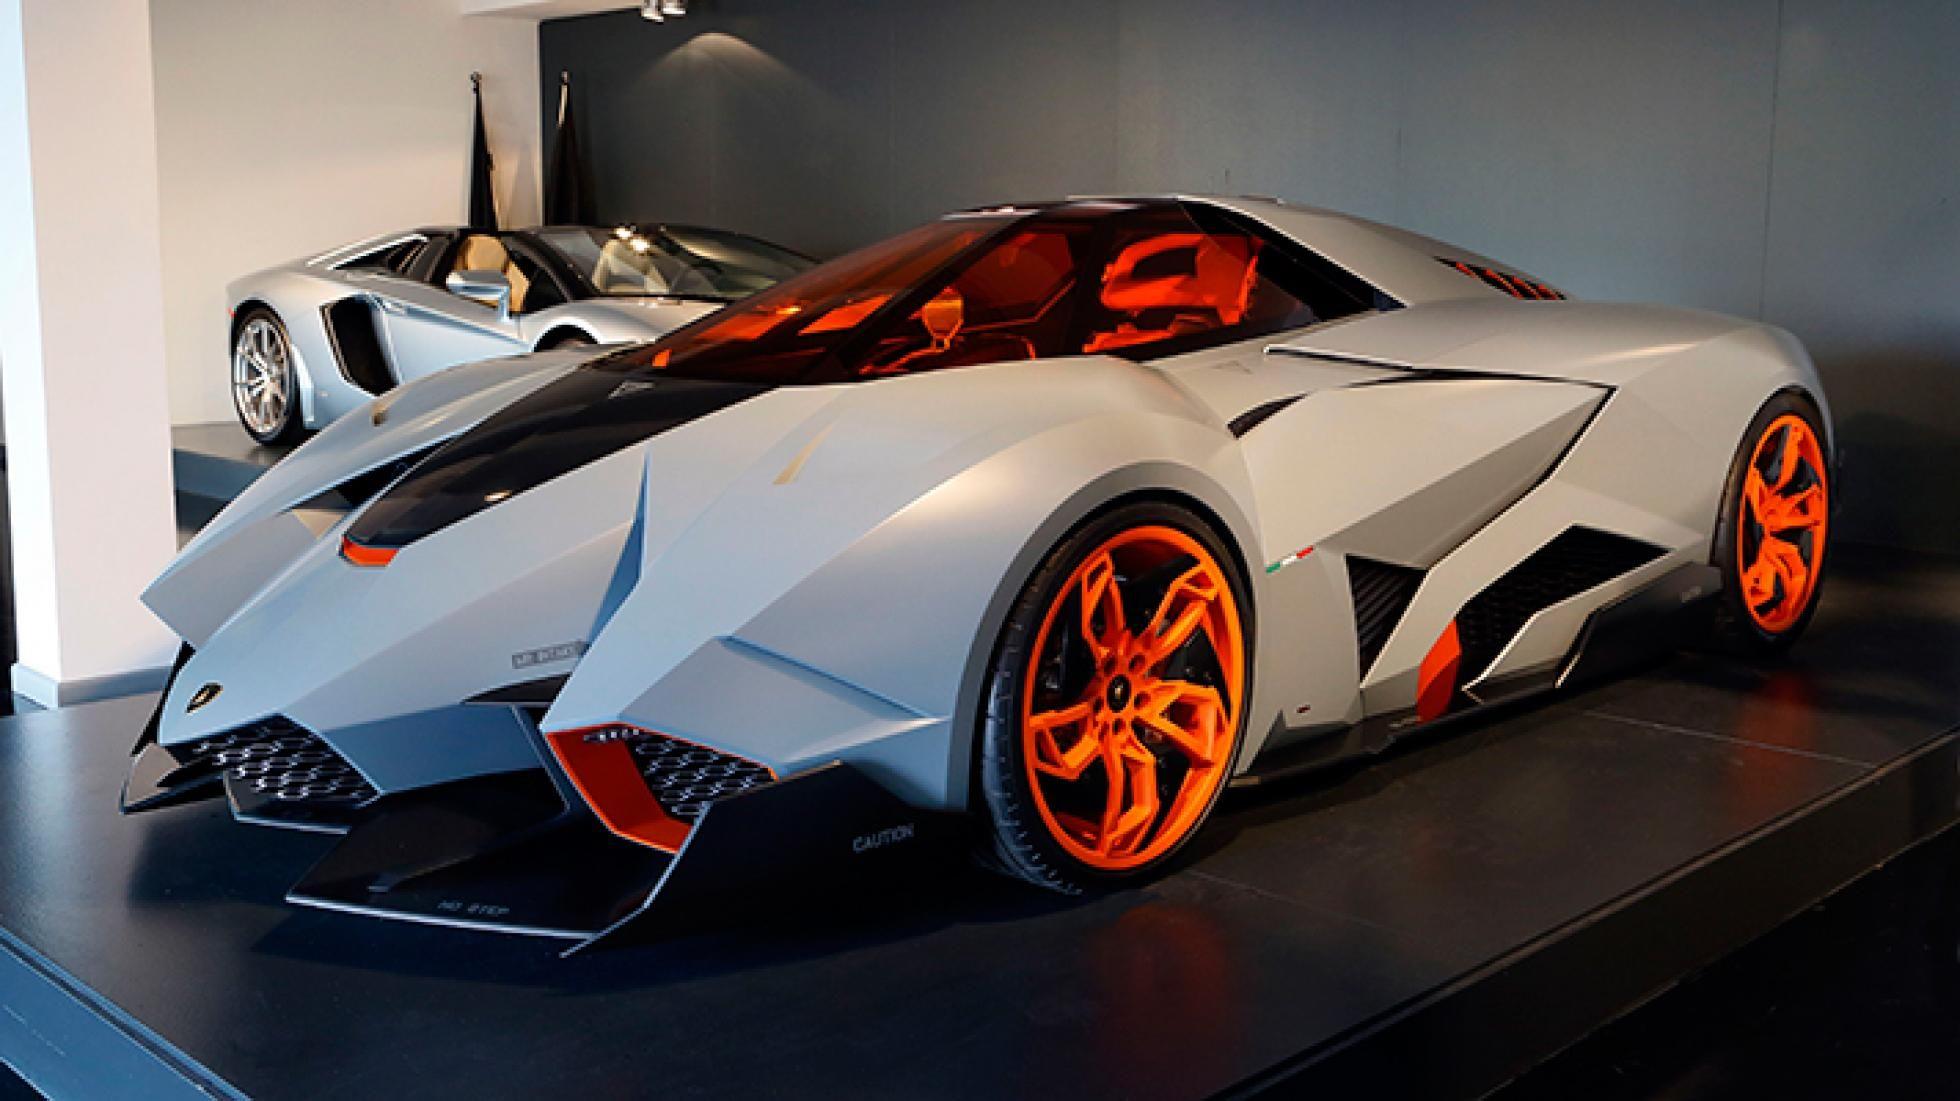 Incroyable Lamborghini Egoista: Now On Public Display | Top Gear